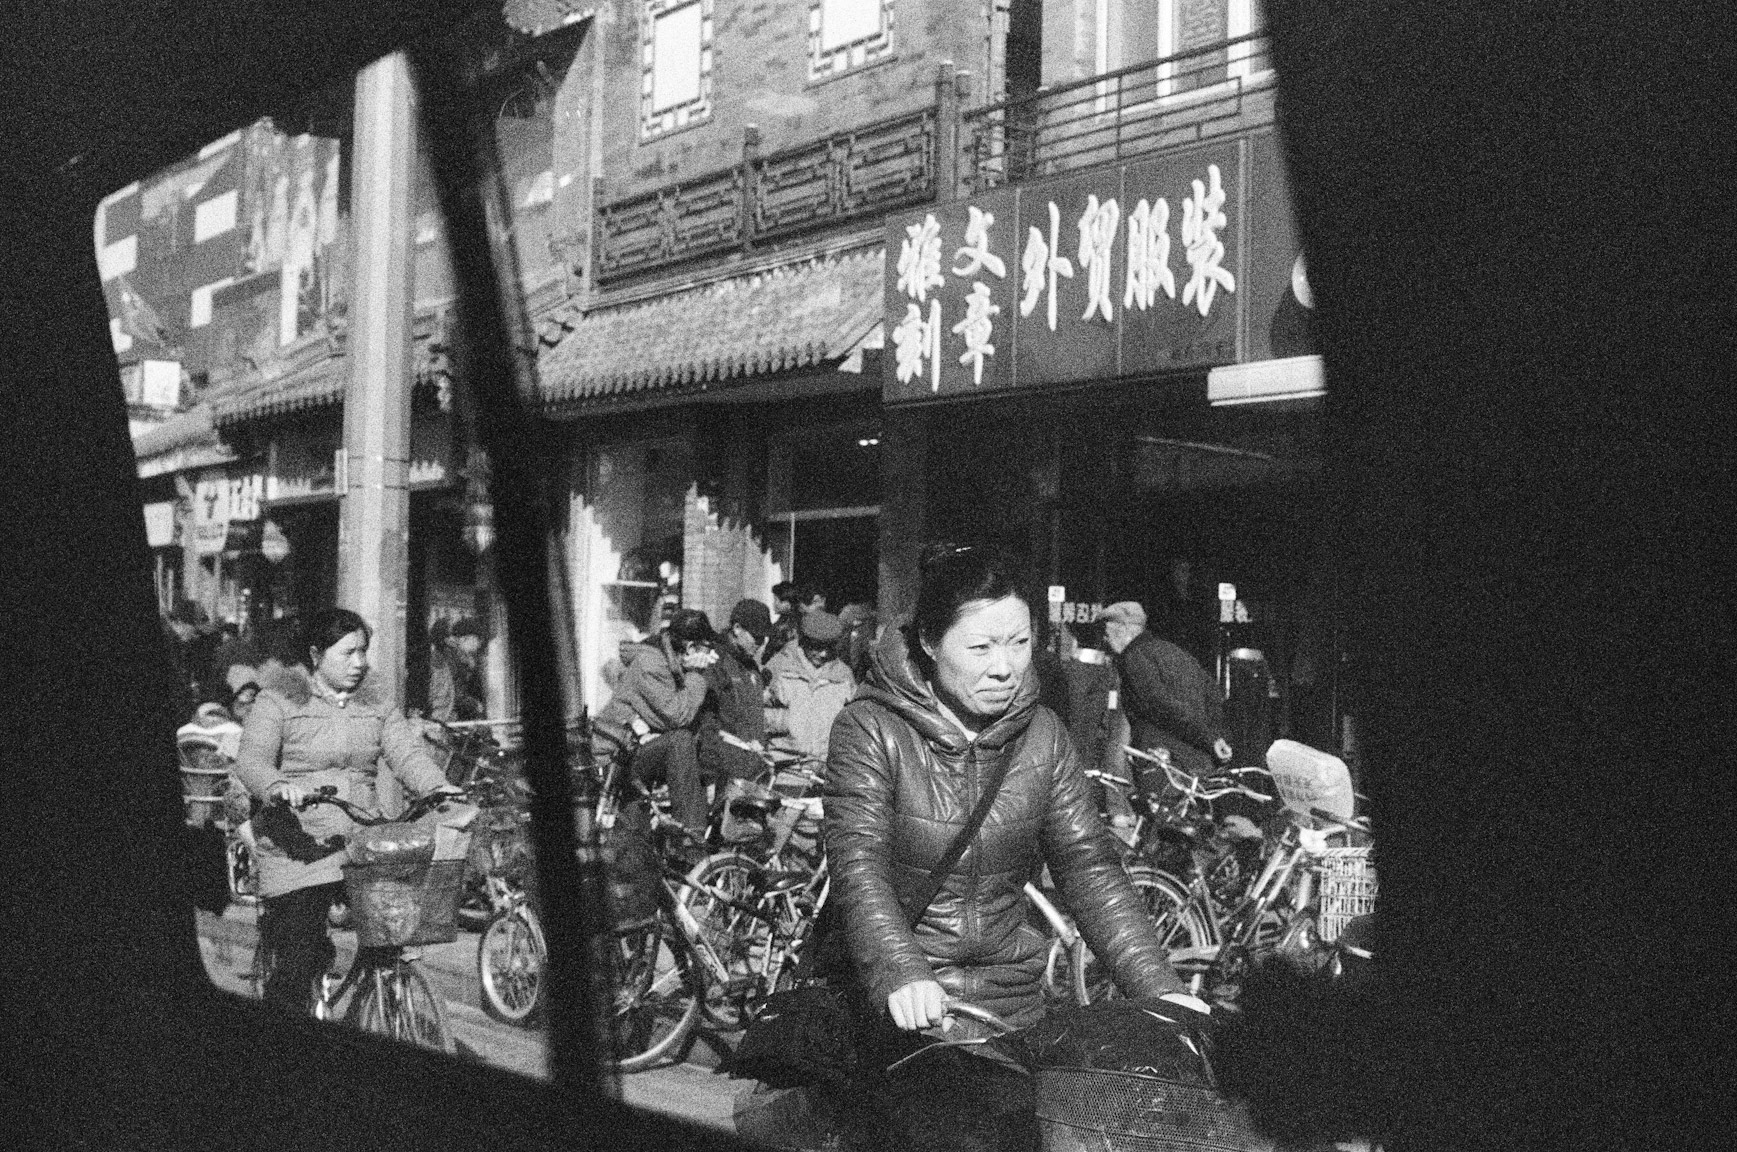 Lady on a bike, Beijing, China